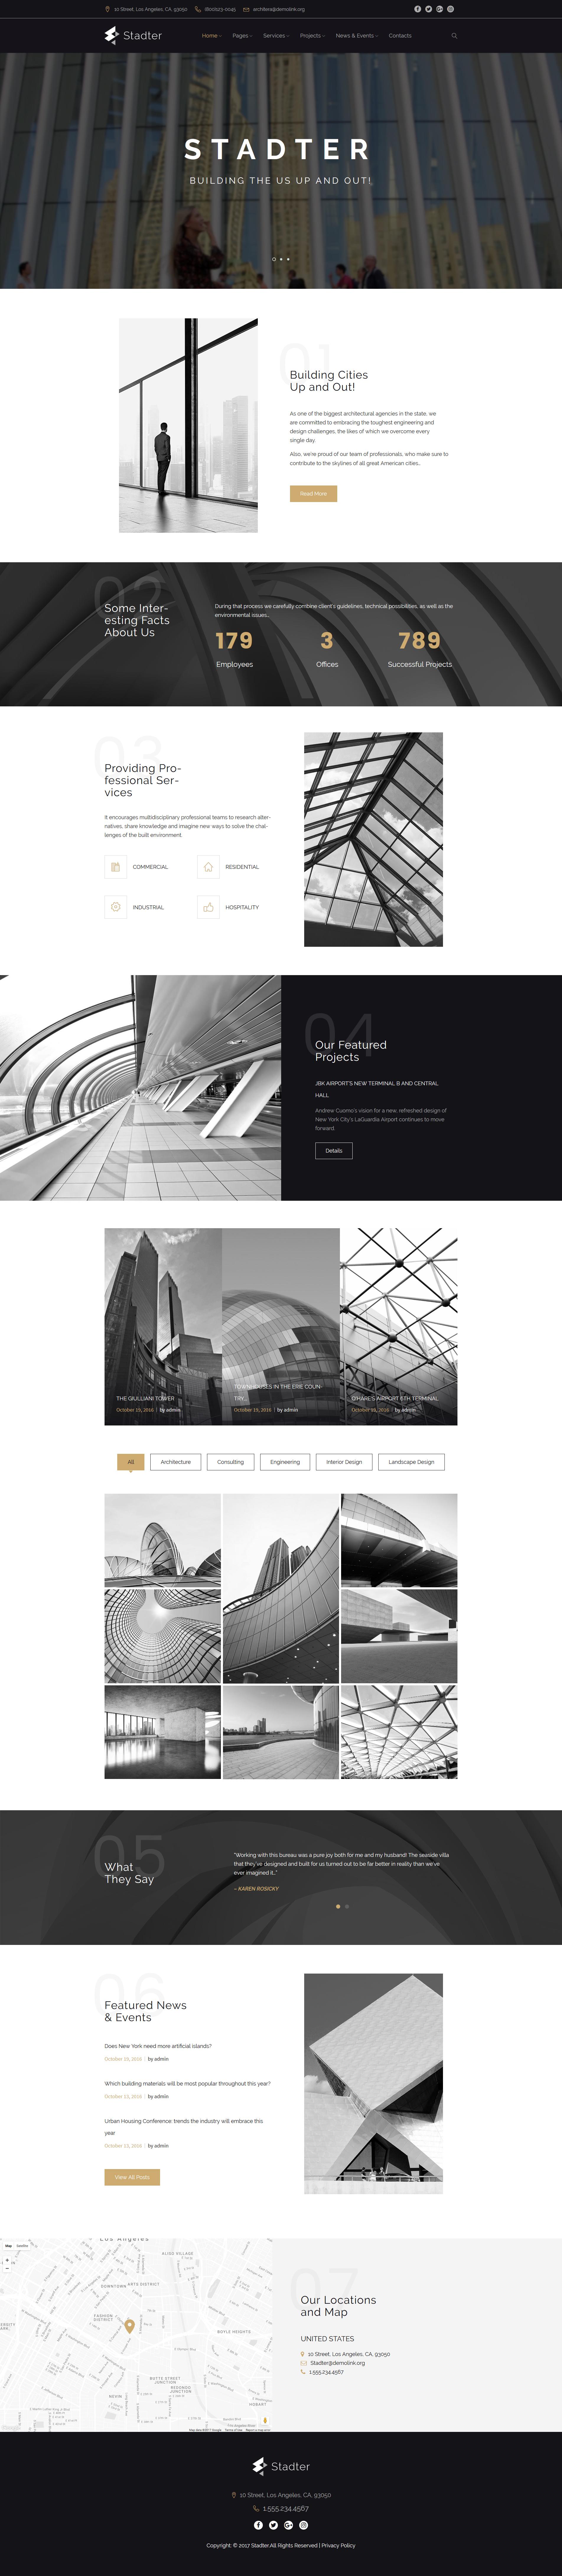 Stadter - Construction Company Tema WordPress №63956 - screenshot